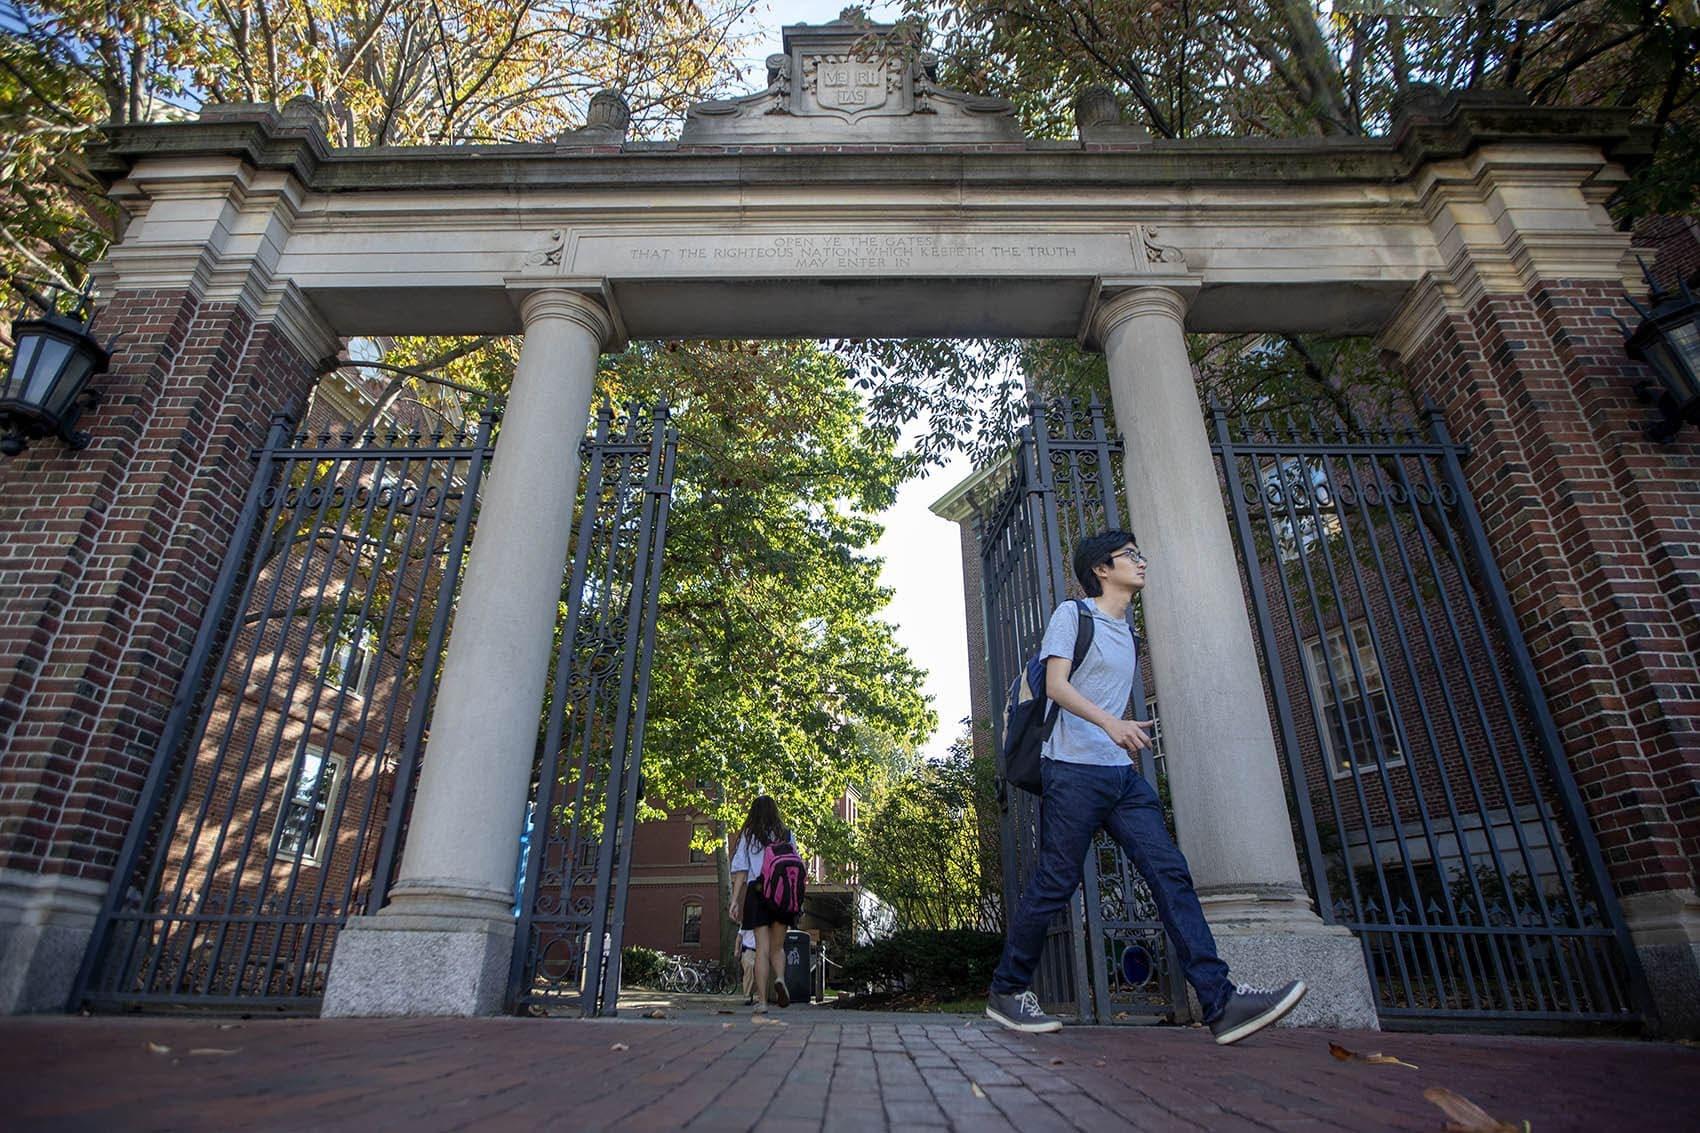 Students walk through the Class of 1875 Gate outside Harvard Yard. (Jesse Costa/WBUR)